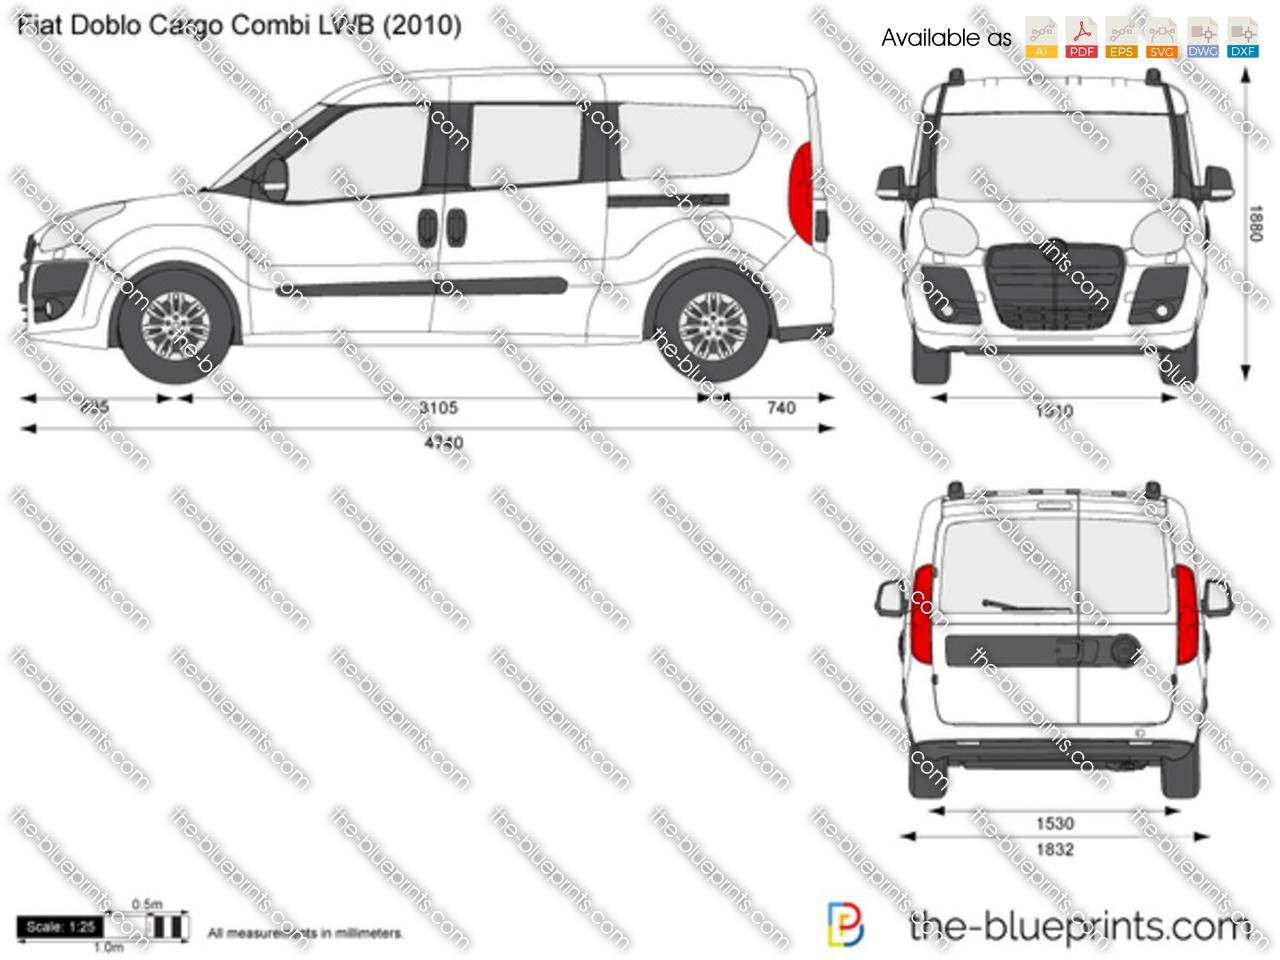 Fiat Doblo Cargo Combi LWB 2015